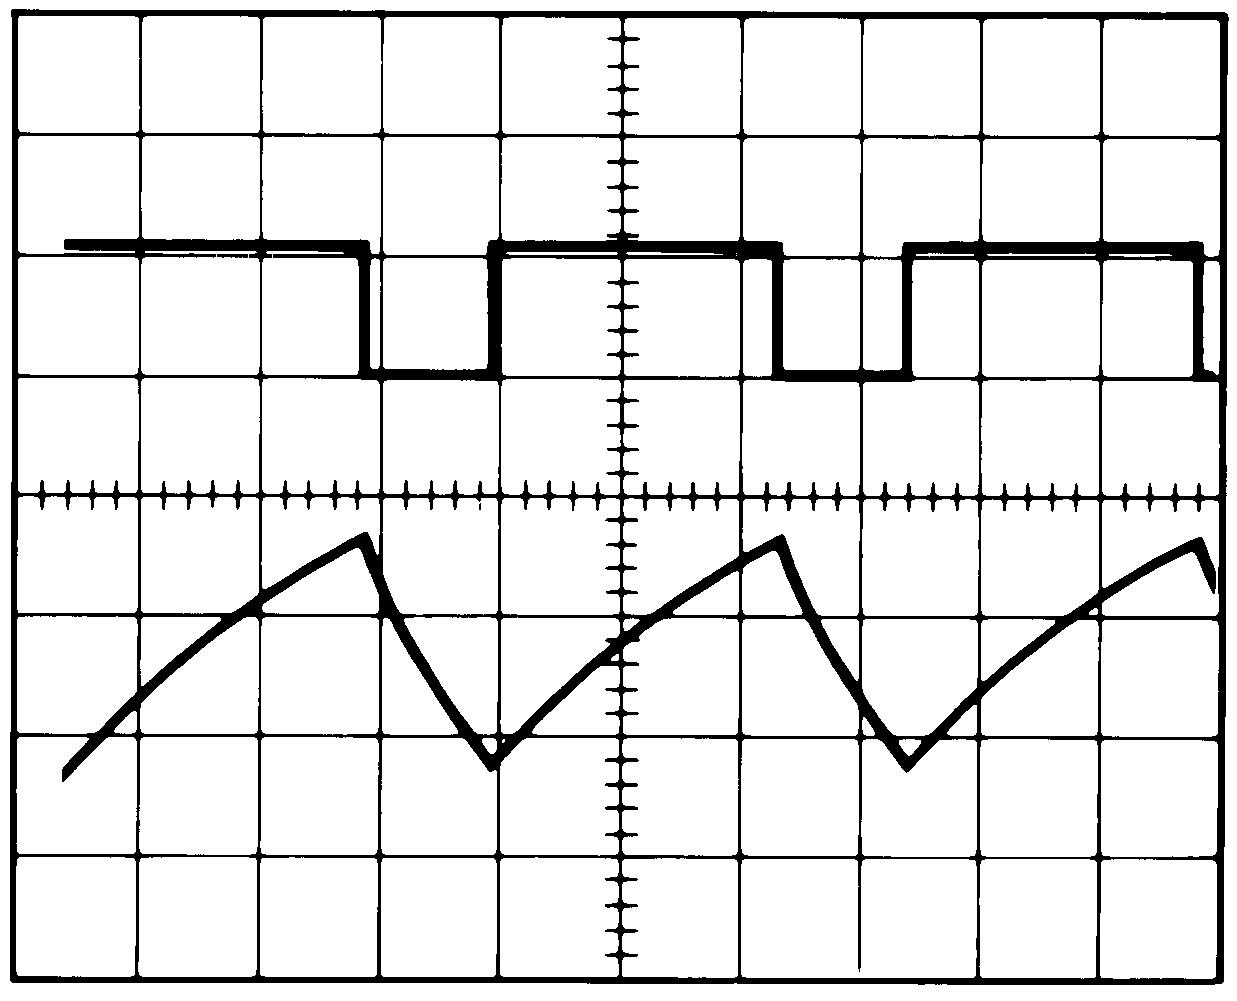 Lm555 Ic Ne 555 Internal Block Diagram 00785109